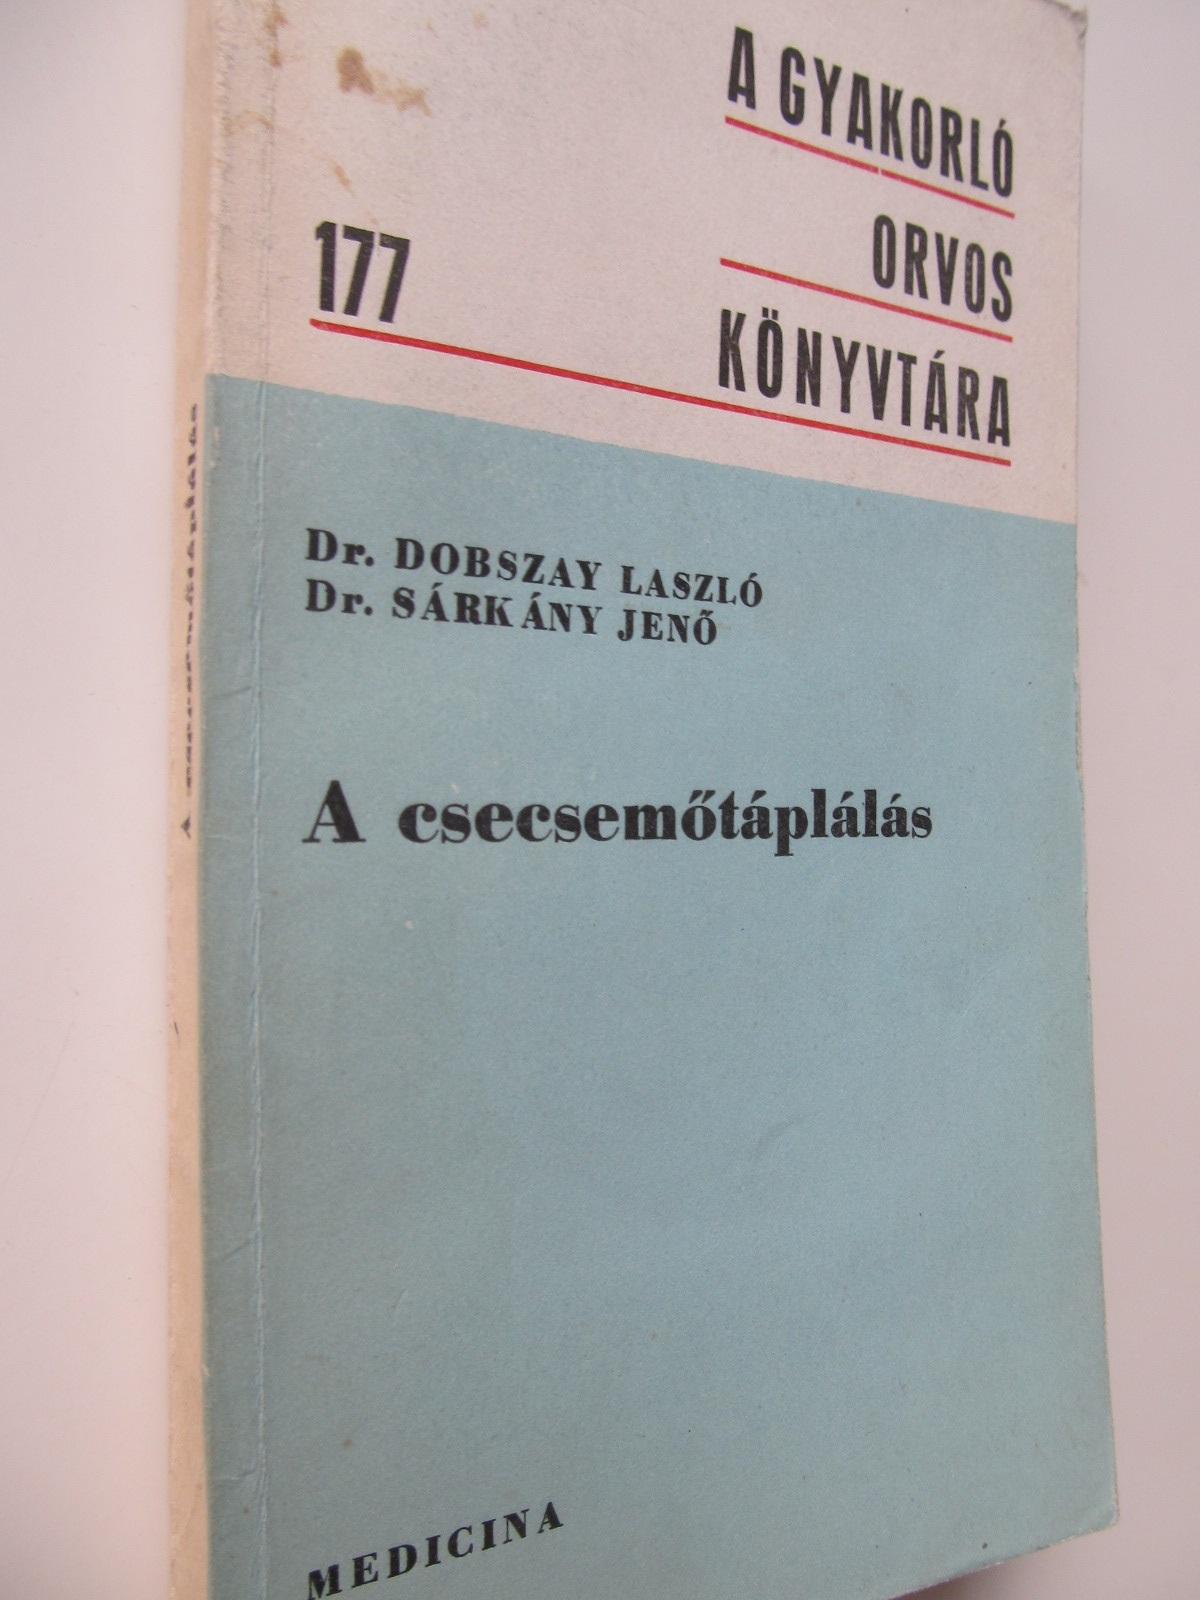 A csecsemotaplalas (hranirea sugarului) - Dobszay Laszlo , Sarkany Jeno | Detalii carte